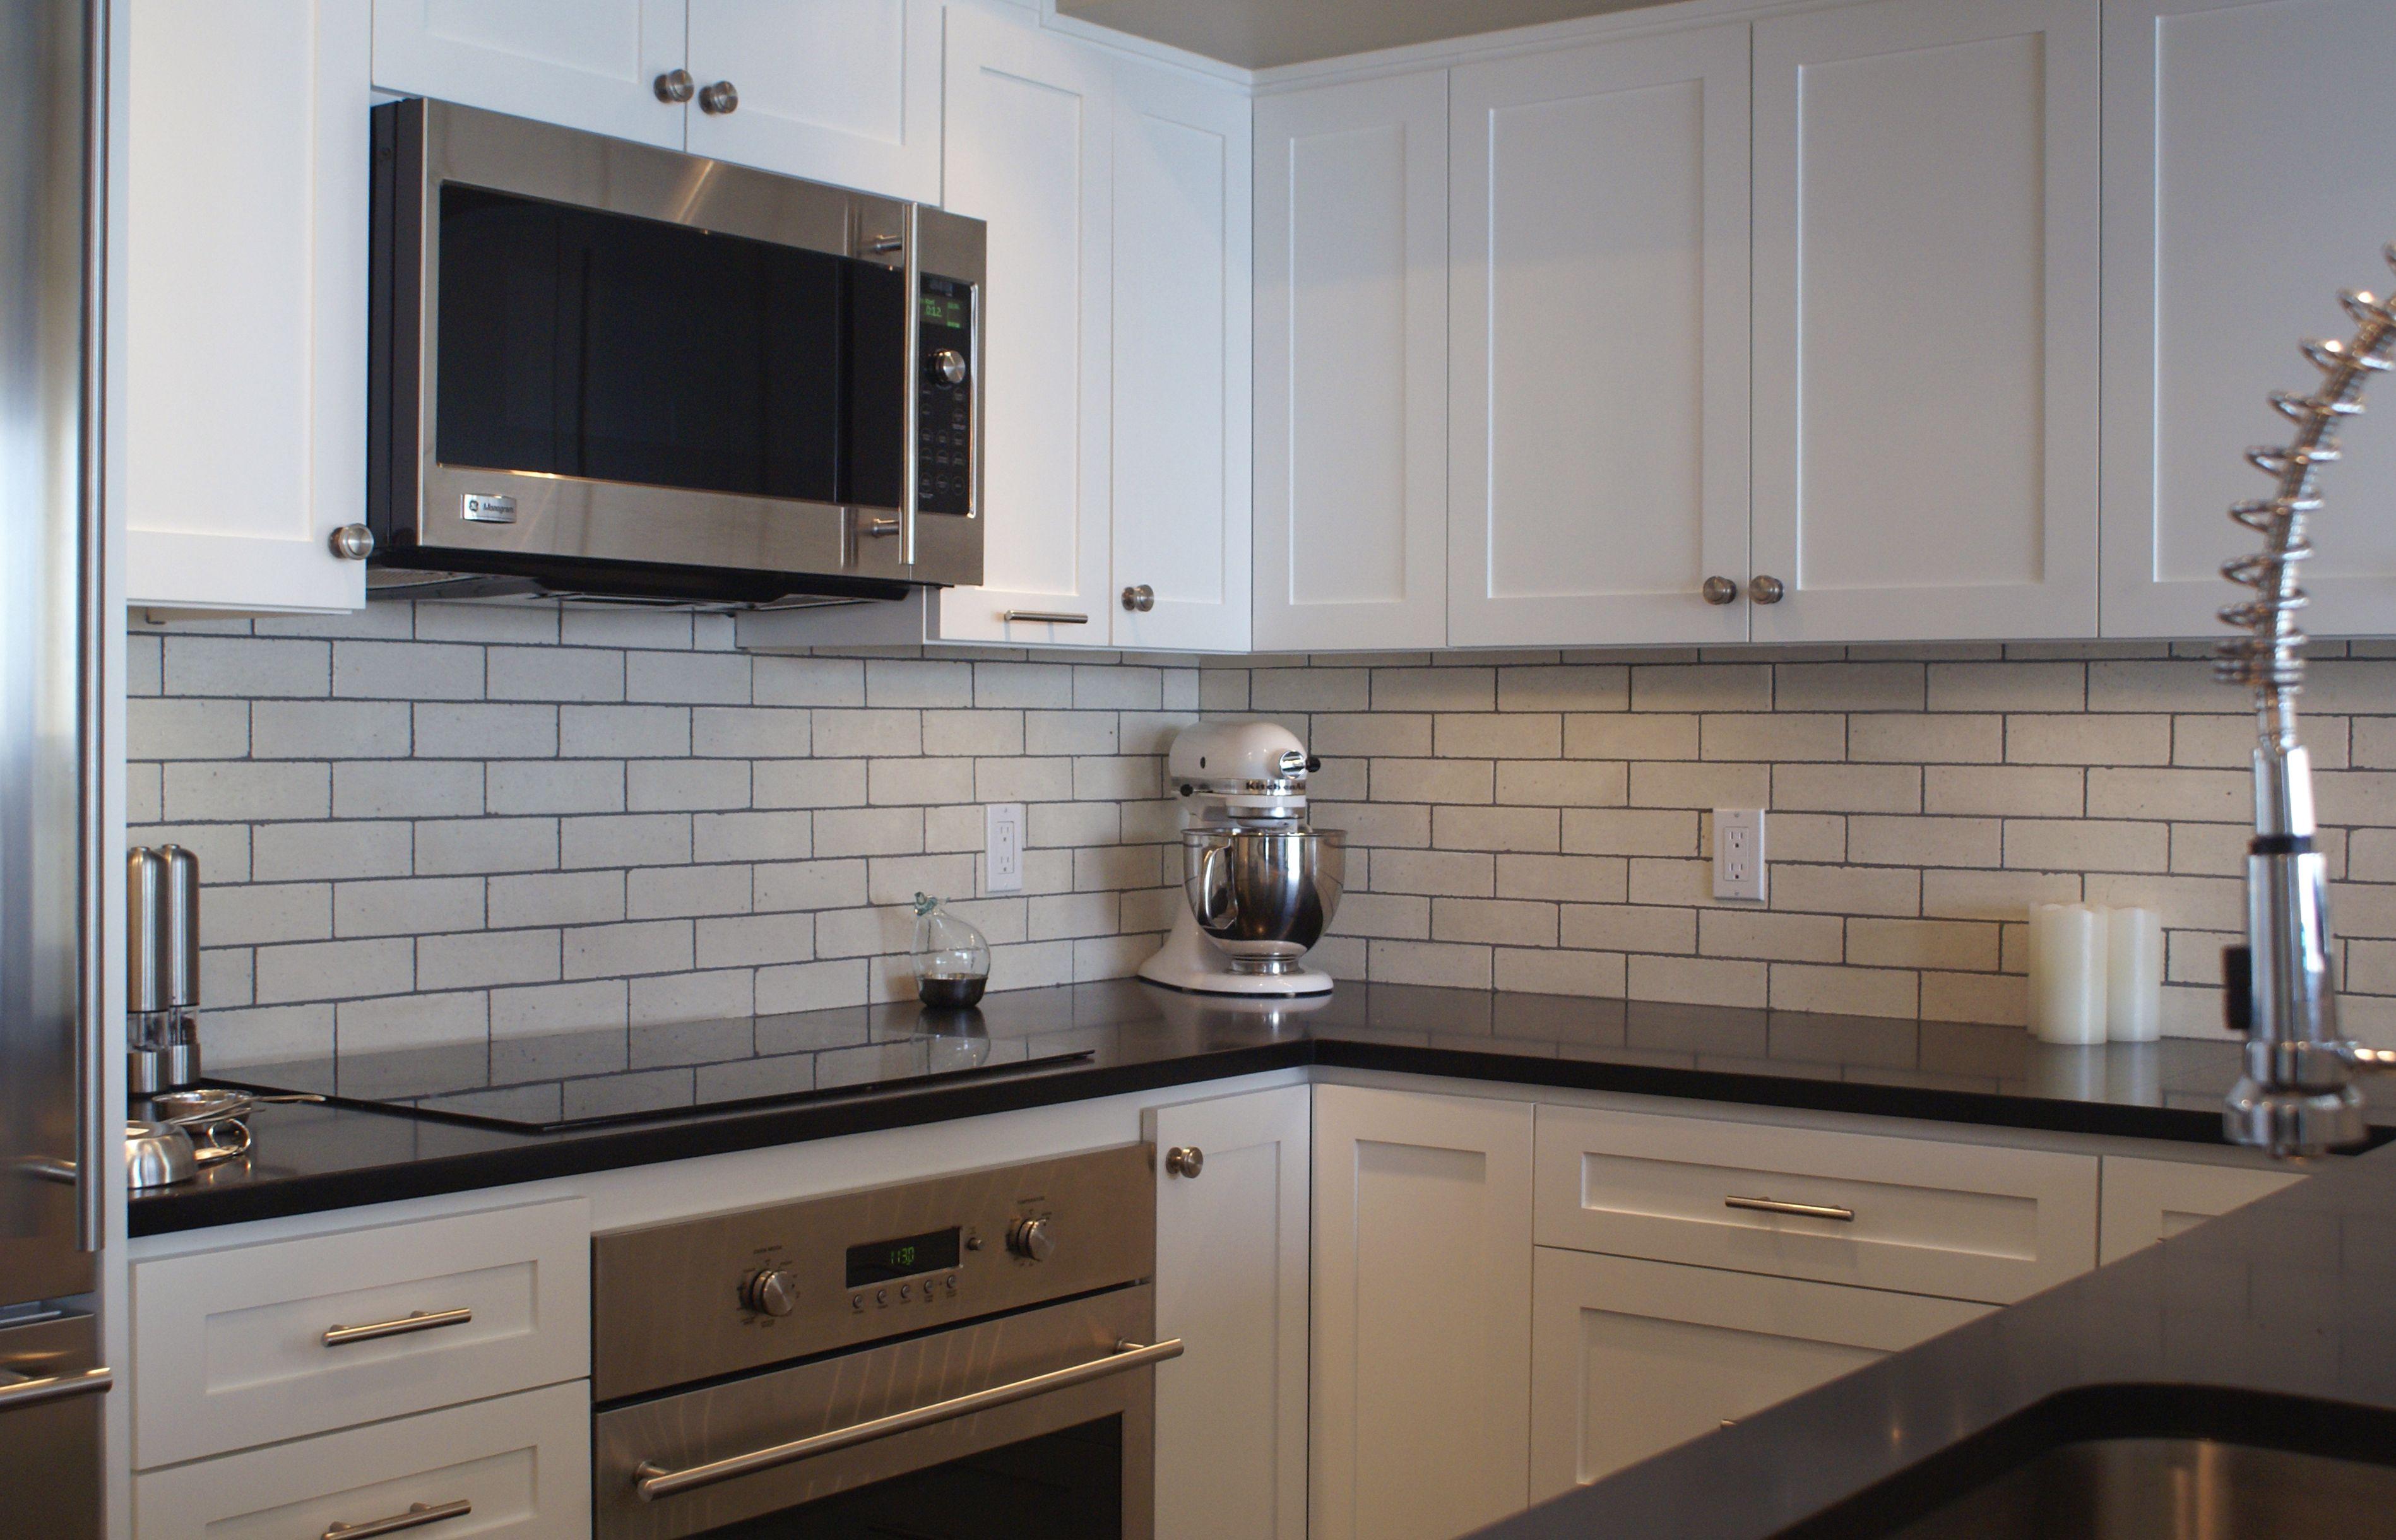 Modern Backsplash For Kitchen Glazed Brick Was Used To Create The Modern Backsplash For This